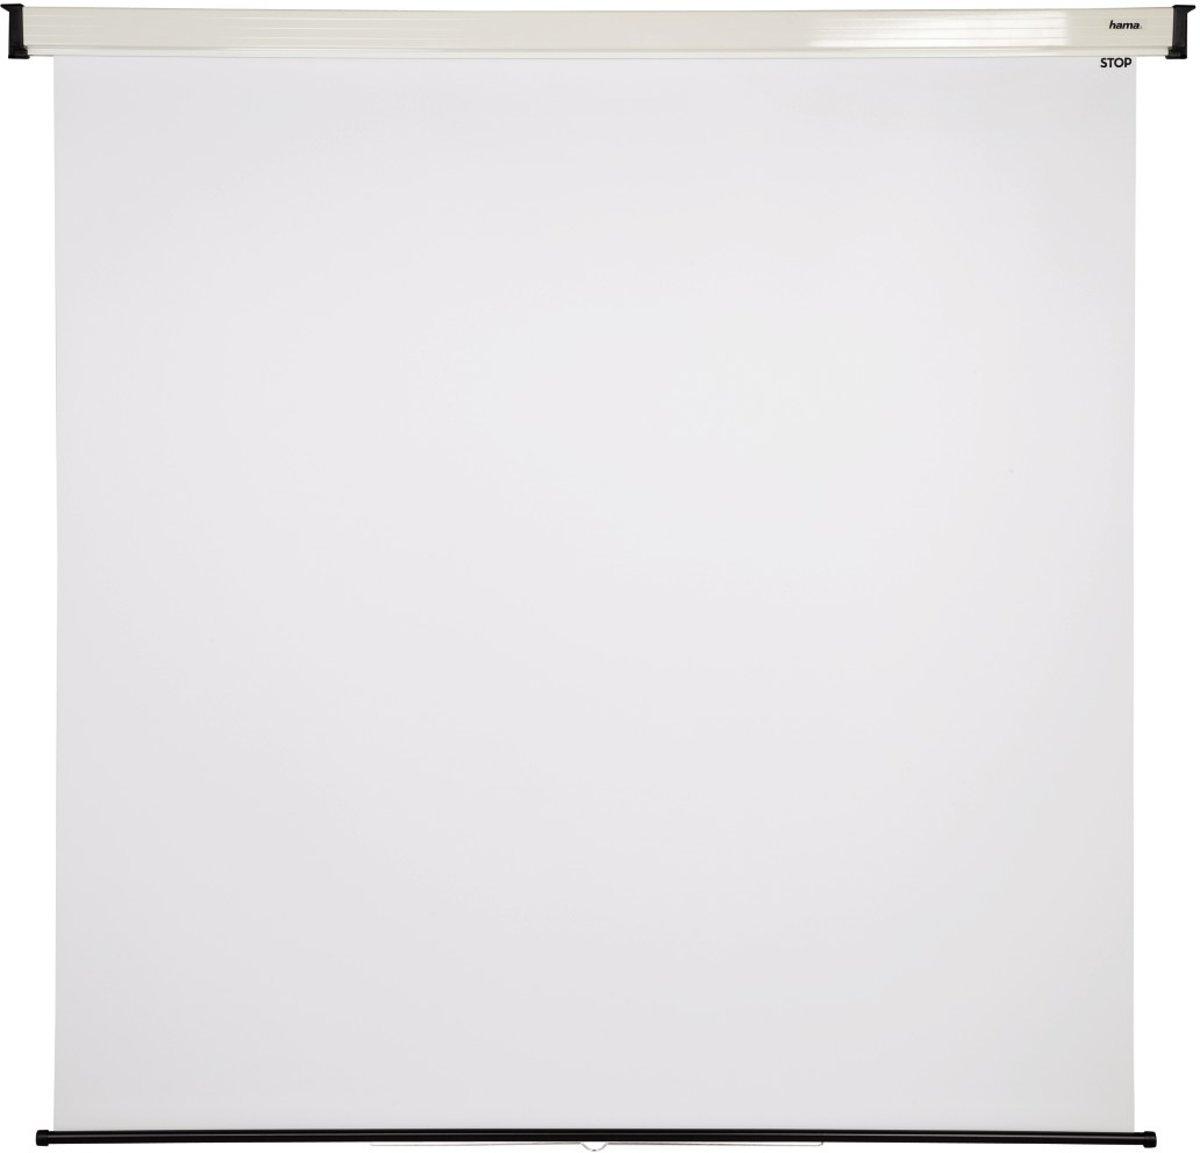 Hama Rollo-Projektionswand, 180 x 180 cm, 1:1 kopen